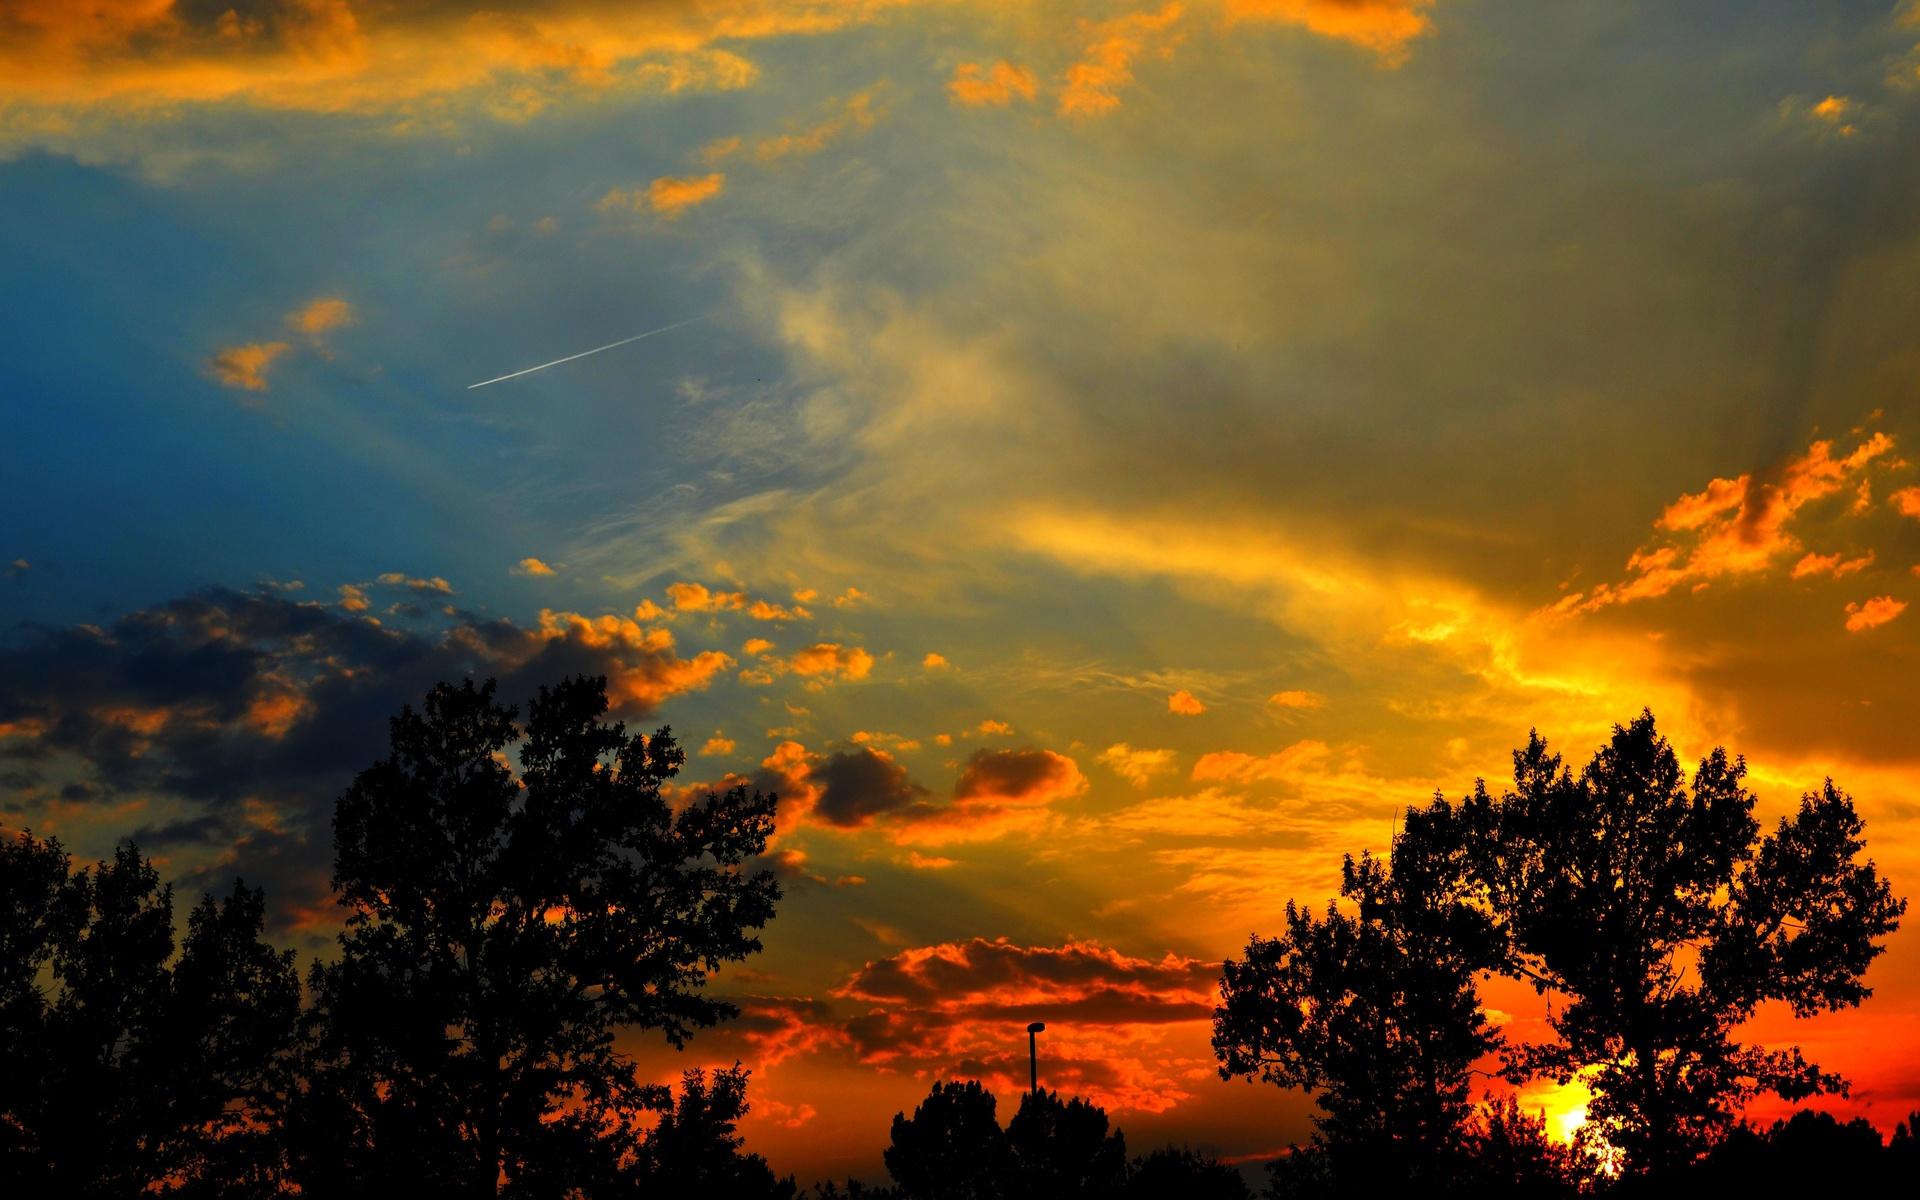 Sunset Silhouette Nature HD Desktop Wallpapers 4k HD